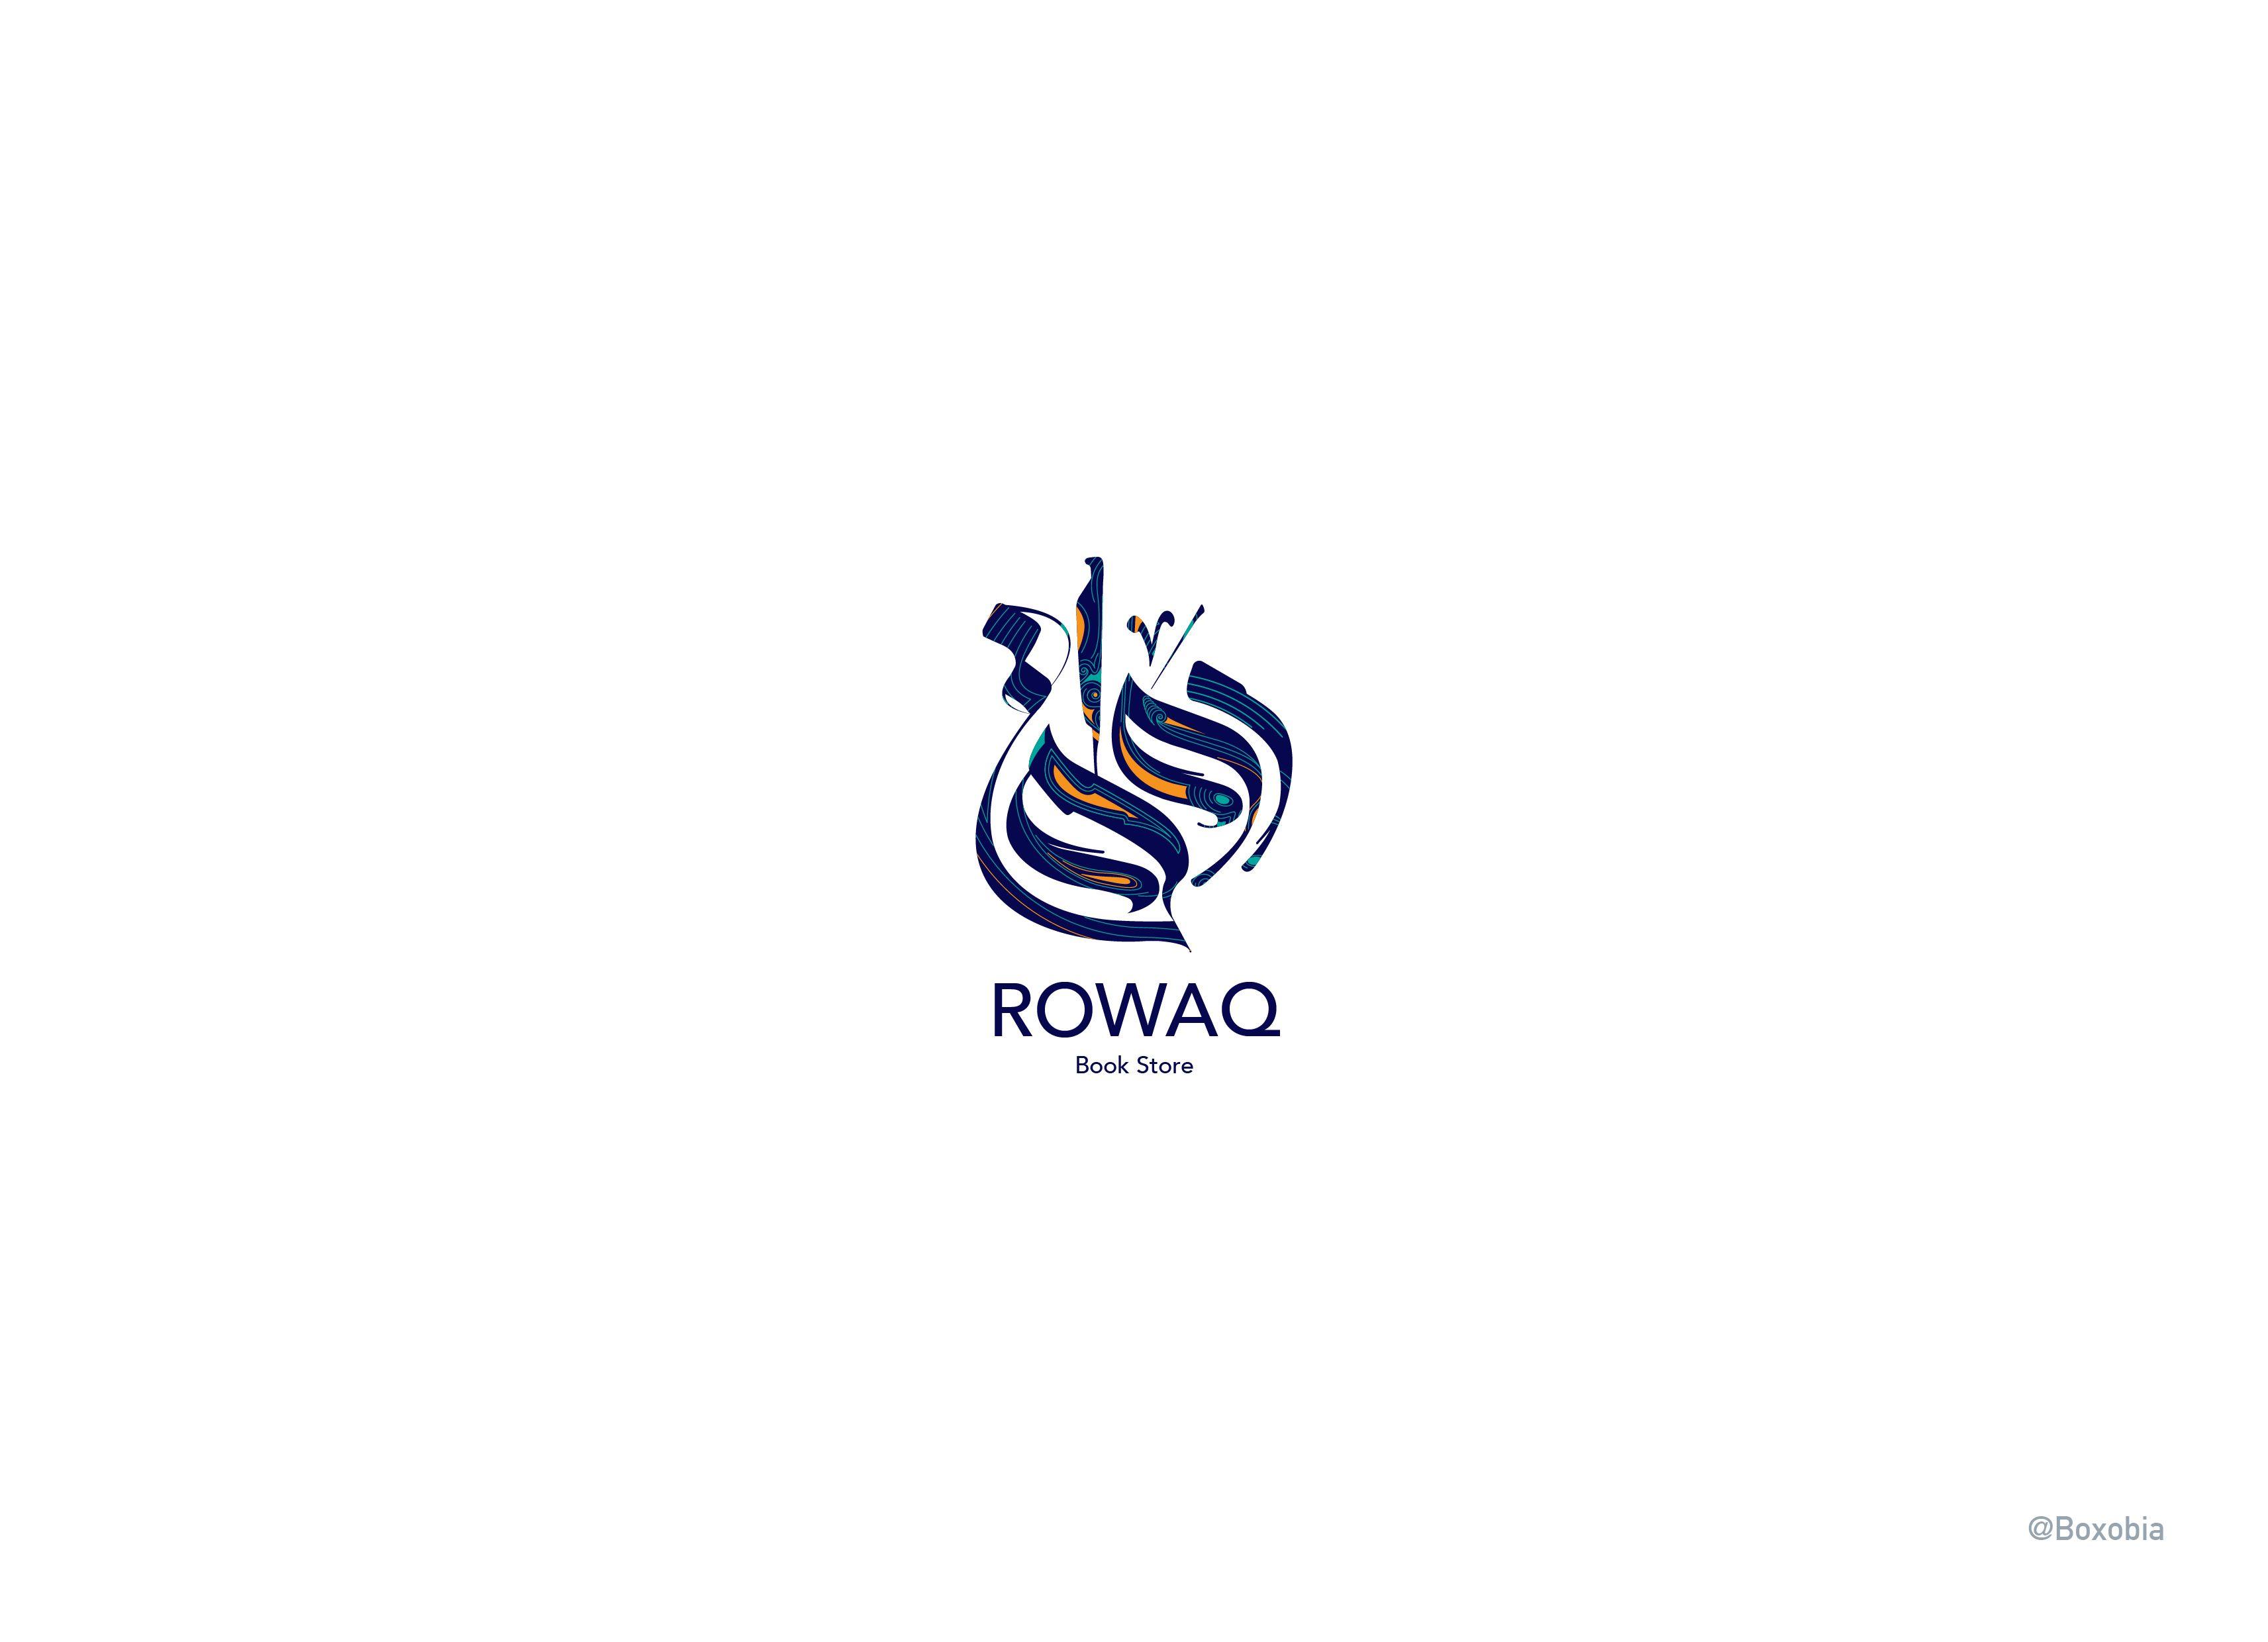 branding logos calligraphy and typography modern arabic